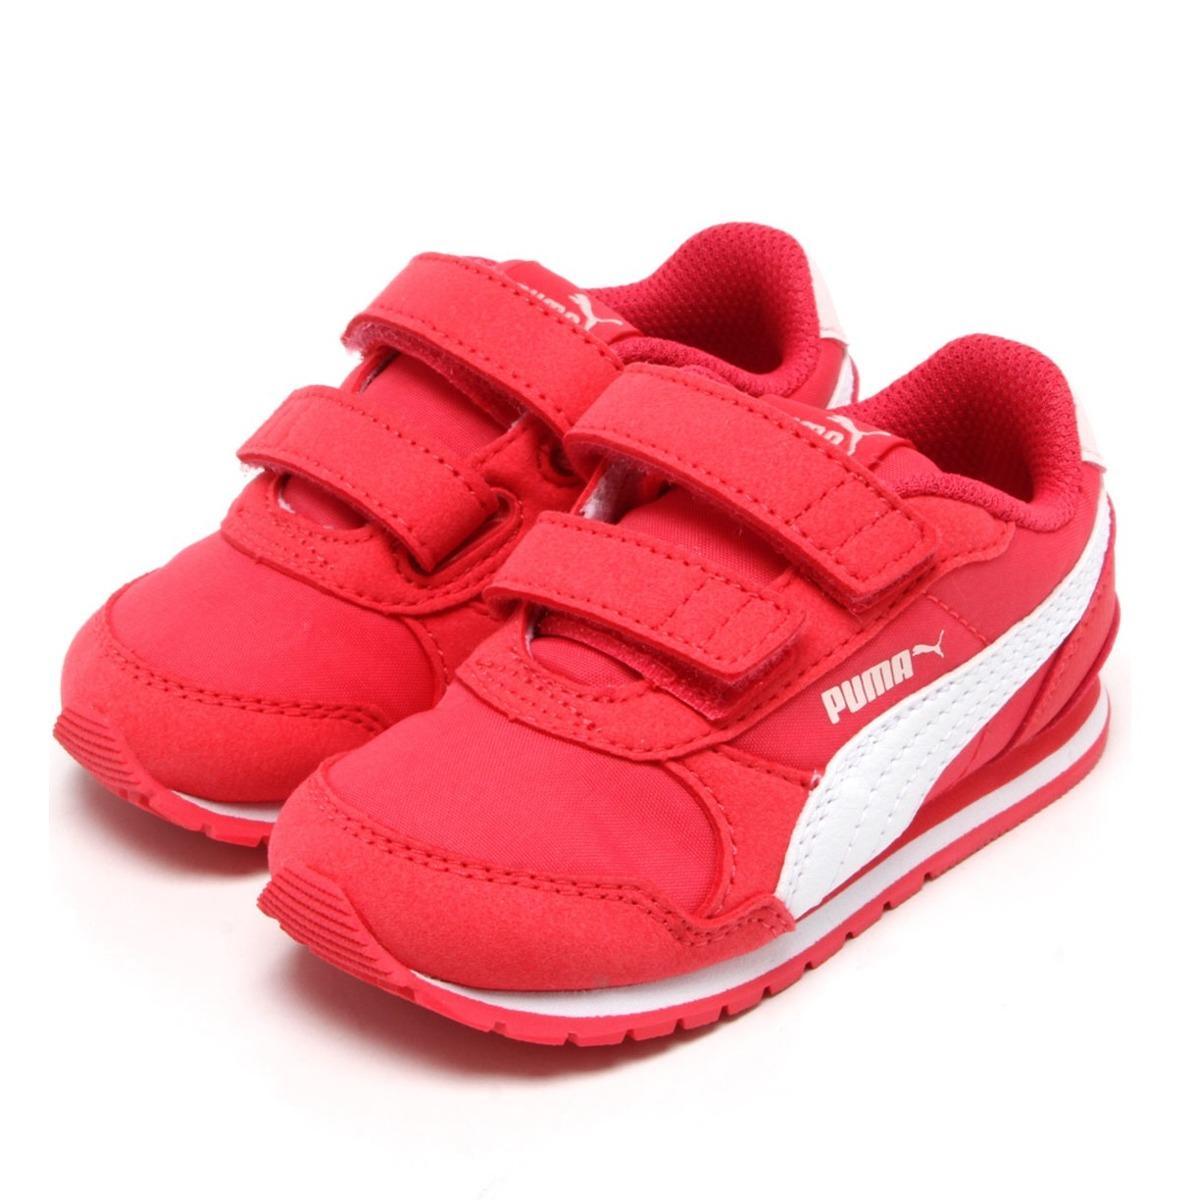 154177928 tênis puma st runner v2 nl v pink branco feminino infantil. Carregando zoom.